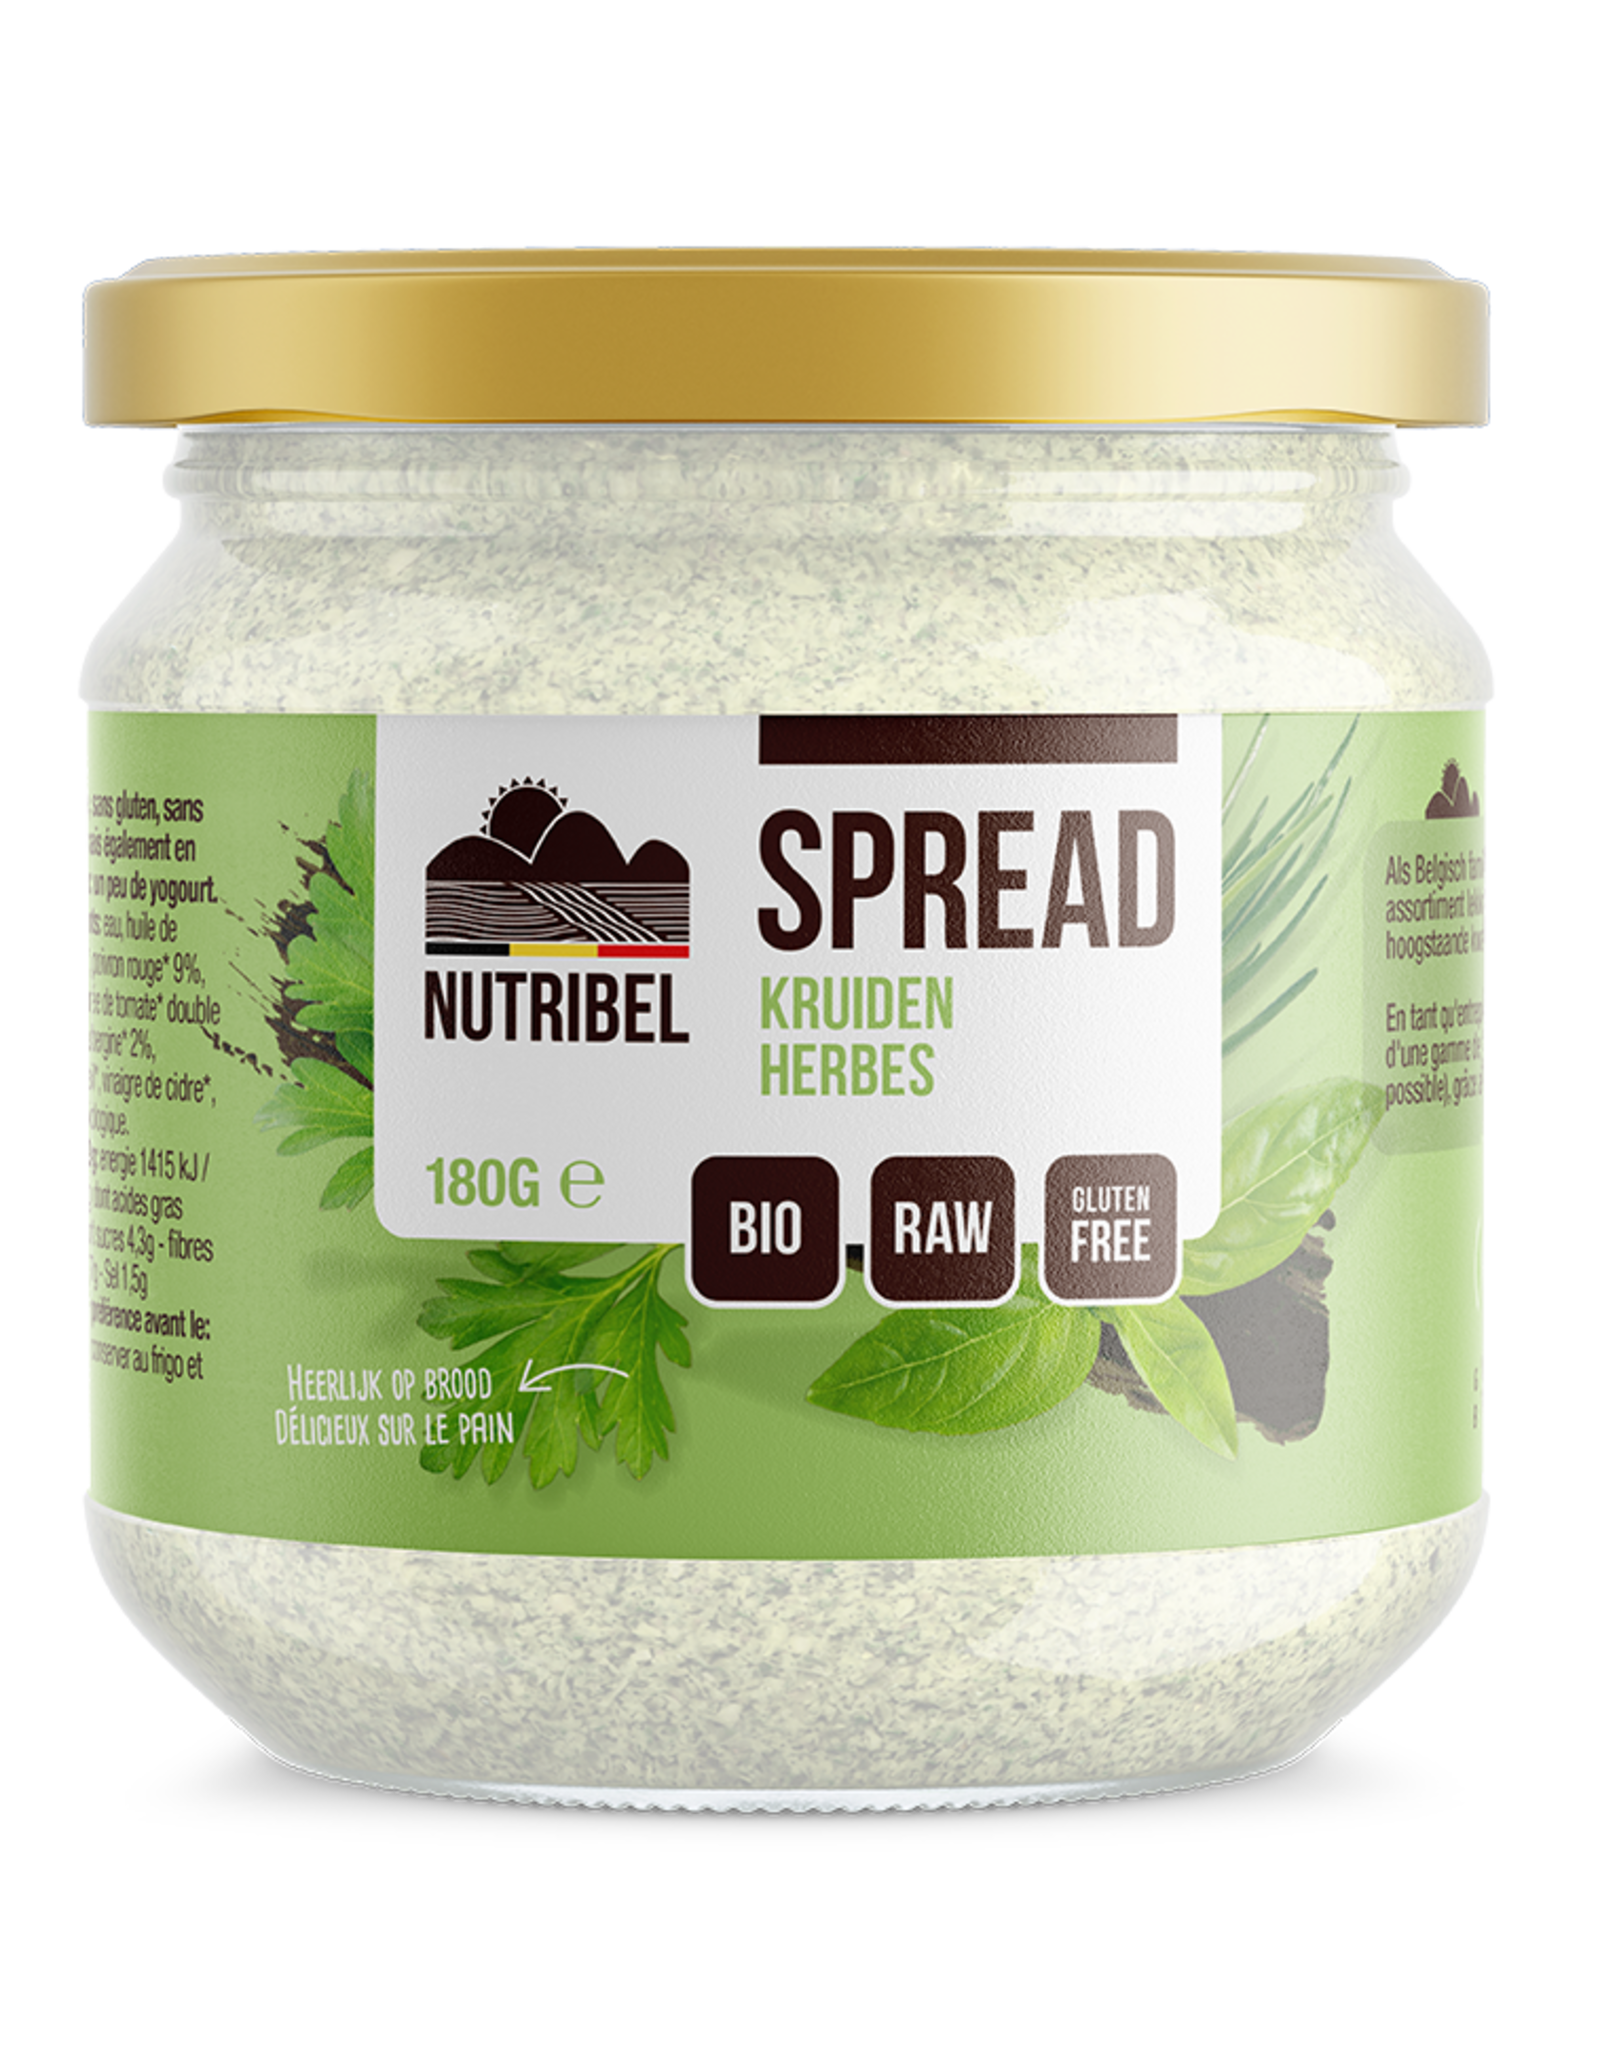 Herbes spread bio 180g